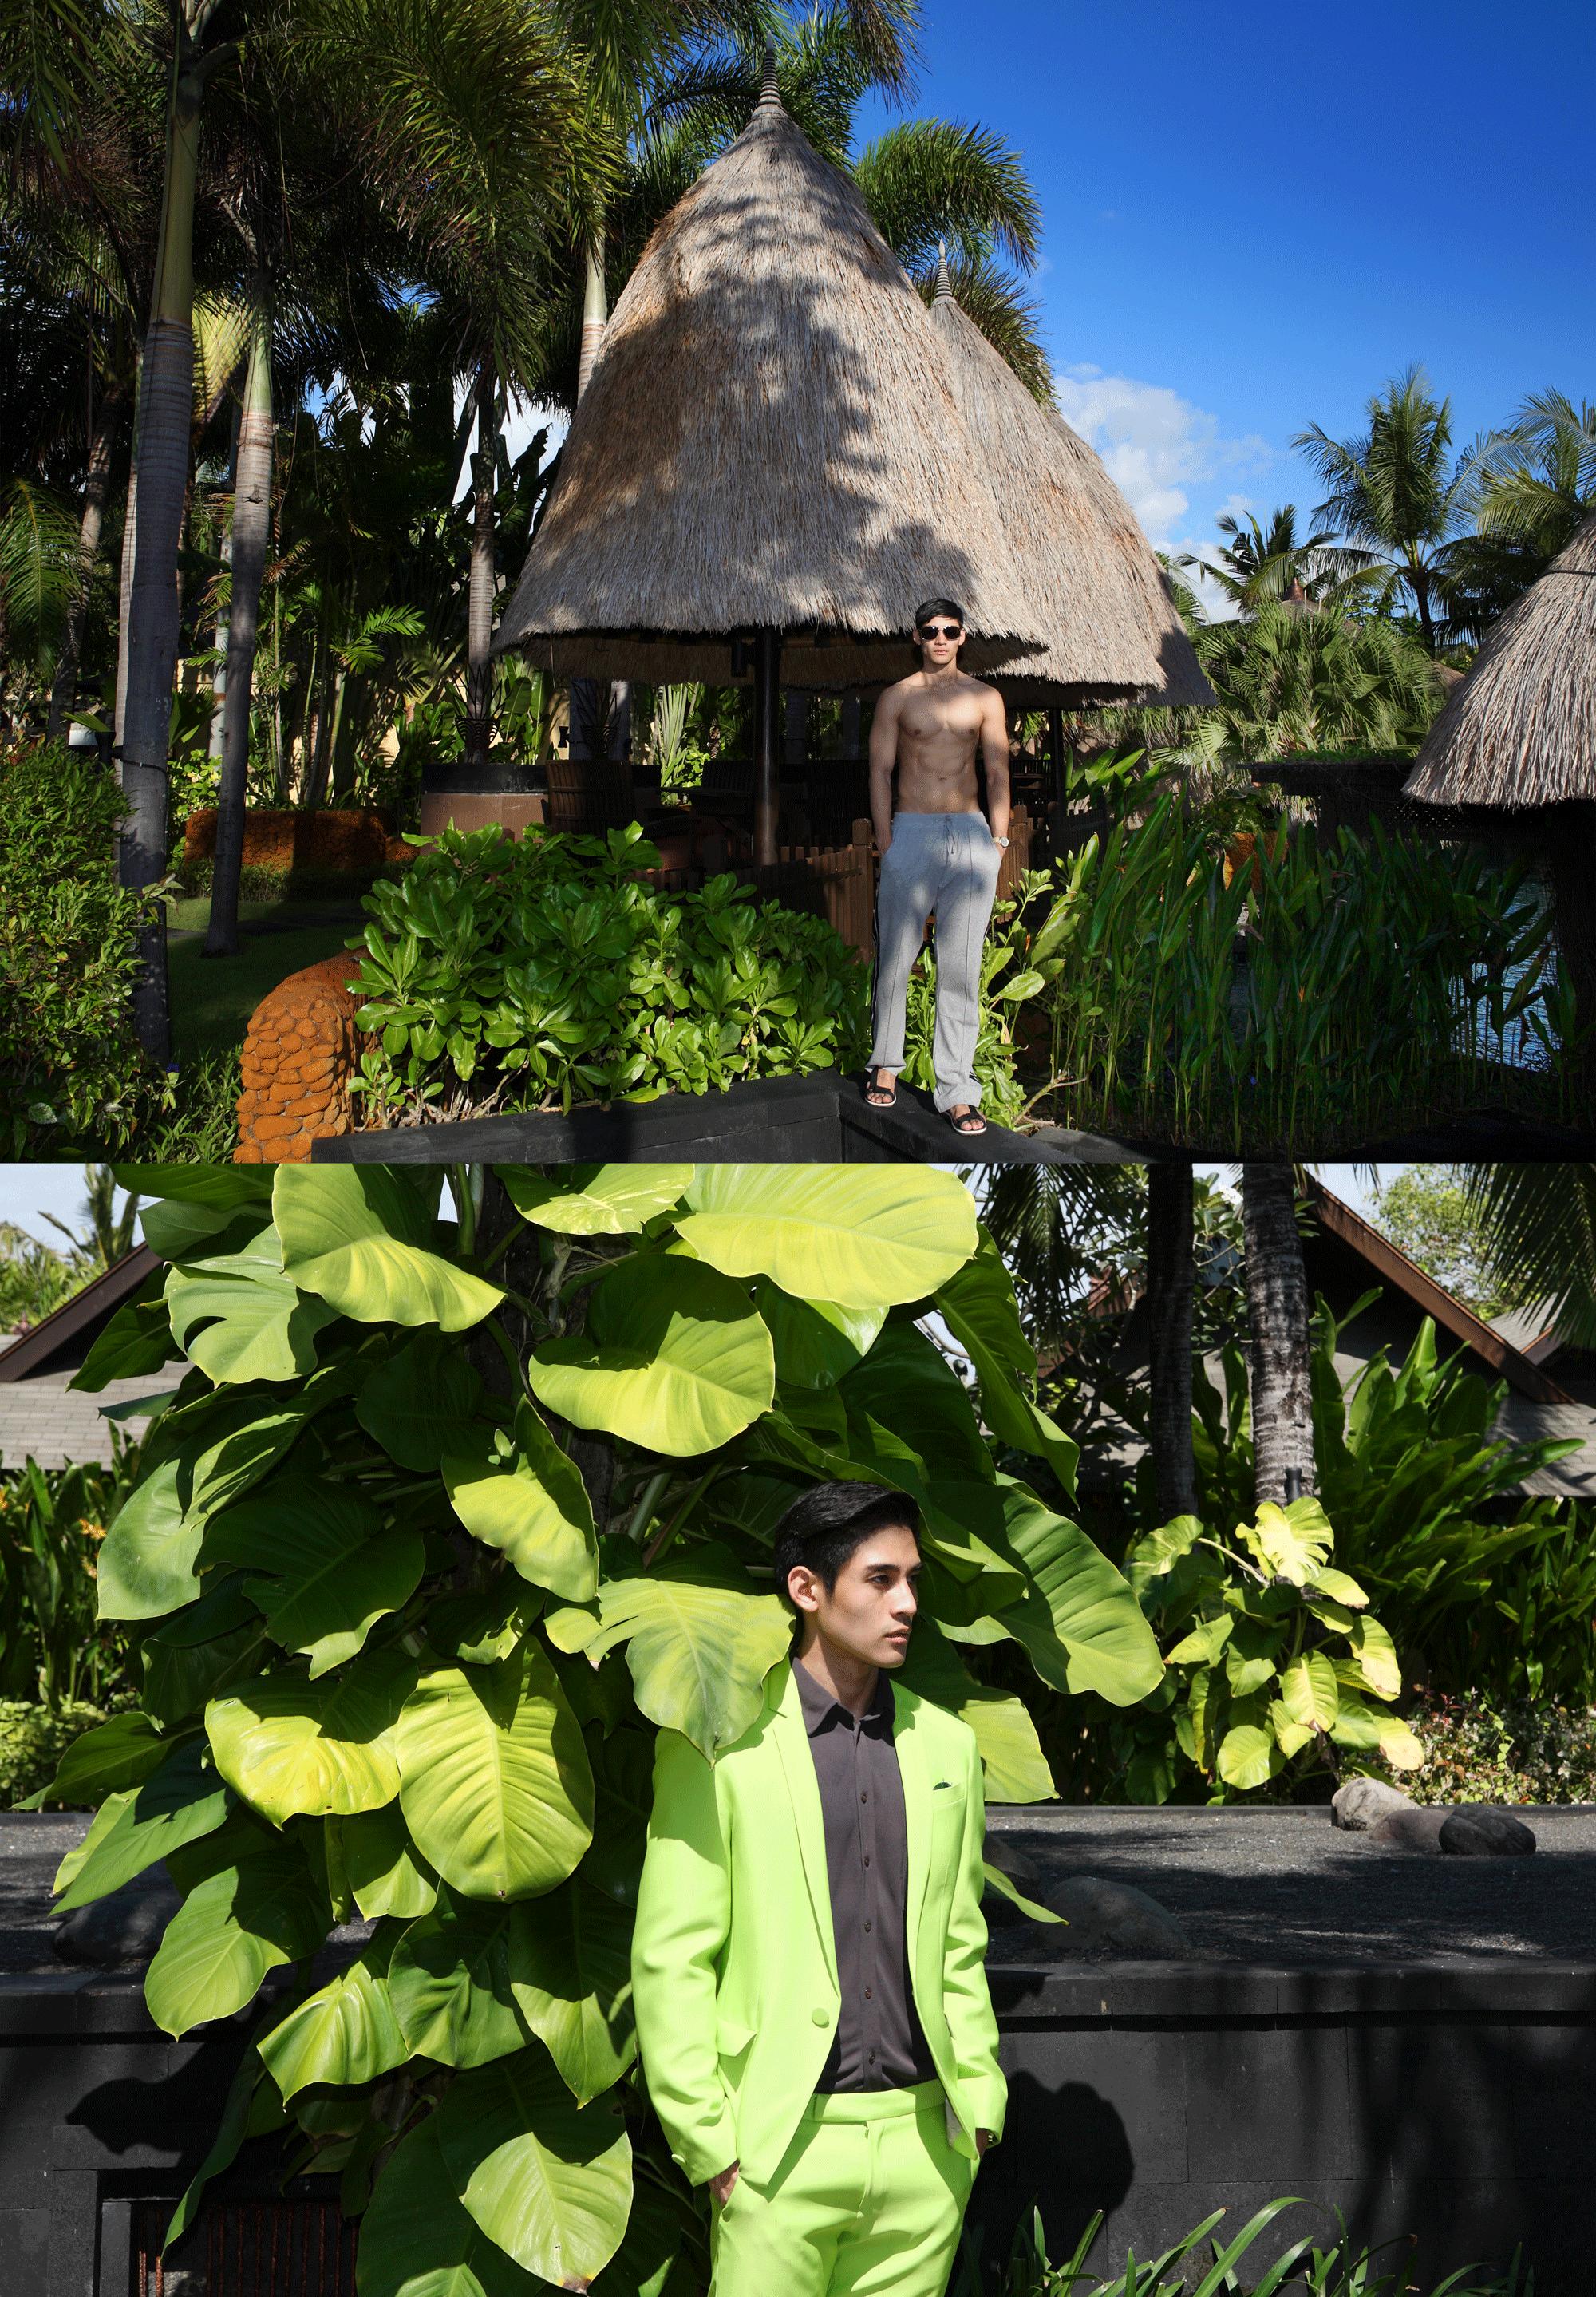 The St. Regis Bali Resort  Photo : Virapoj Tu Asavajarn  Model : Nuttapon Chonvibool @nc_cholvibool  Clothes : SARIT @sarit_ig  ISSUE @issuethailand  Watches : CALVIN KLEIN  Location : The St. Regis Bali Resort  Kawasan Pariwisata Nusa Dua Lot S6, Bali 80363, Indonesia  Tel +62-361-8478-111   www.stregisbali.com   Special Thanks : Khun Rosalyn Sayswang